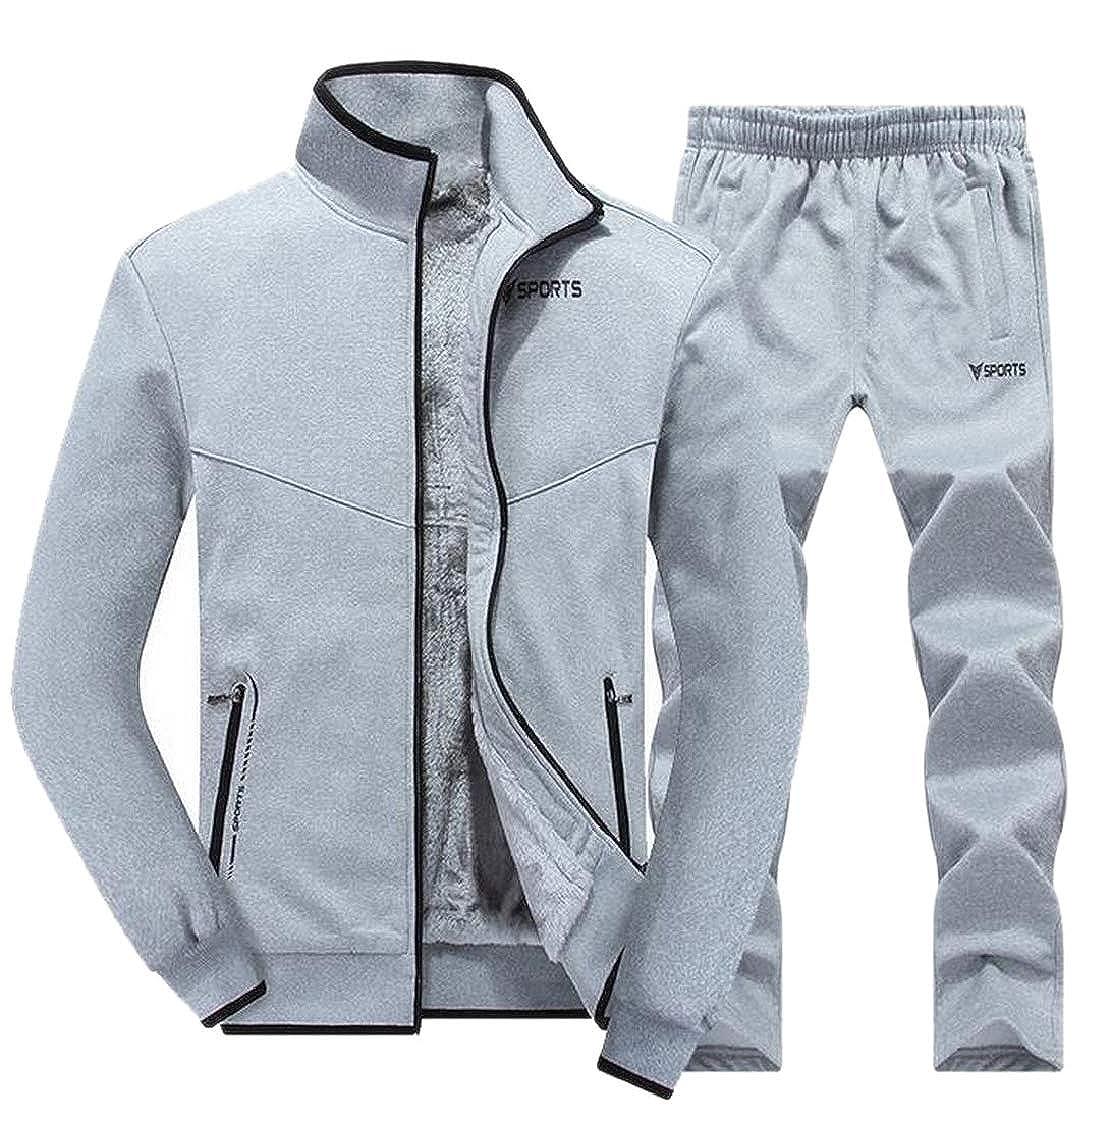 M/&S/&W Mens Activewear Tracksuits Jacket /& Pants Jogging Two Pieces Full Zip Sweatsuit